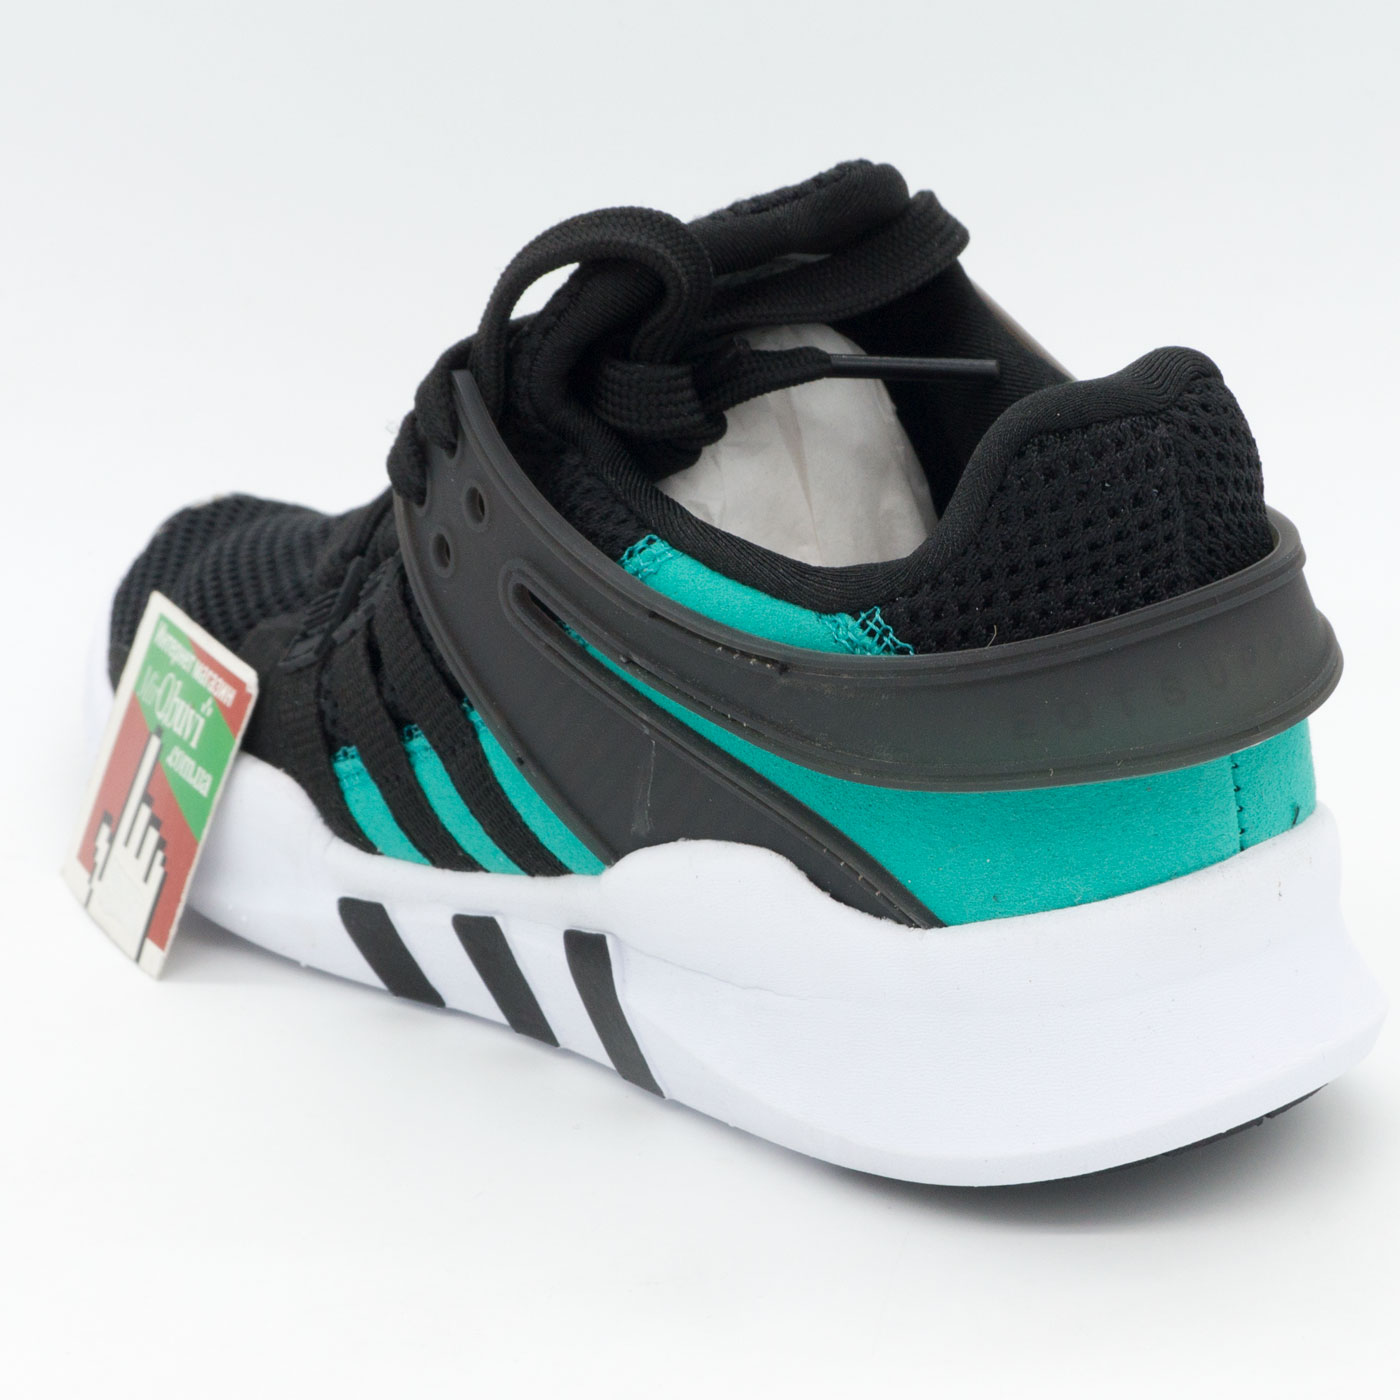 фото back Кроссовки Adidas Equipment support (EQT) черные с зеленым back